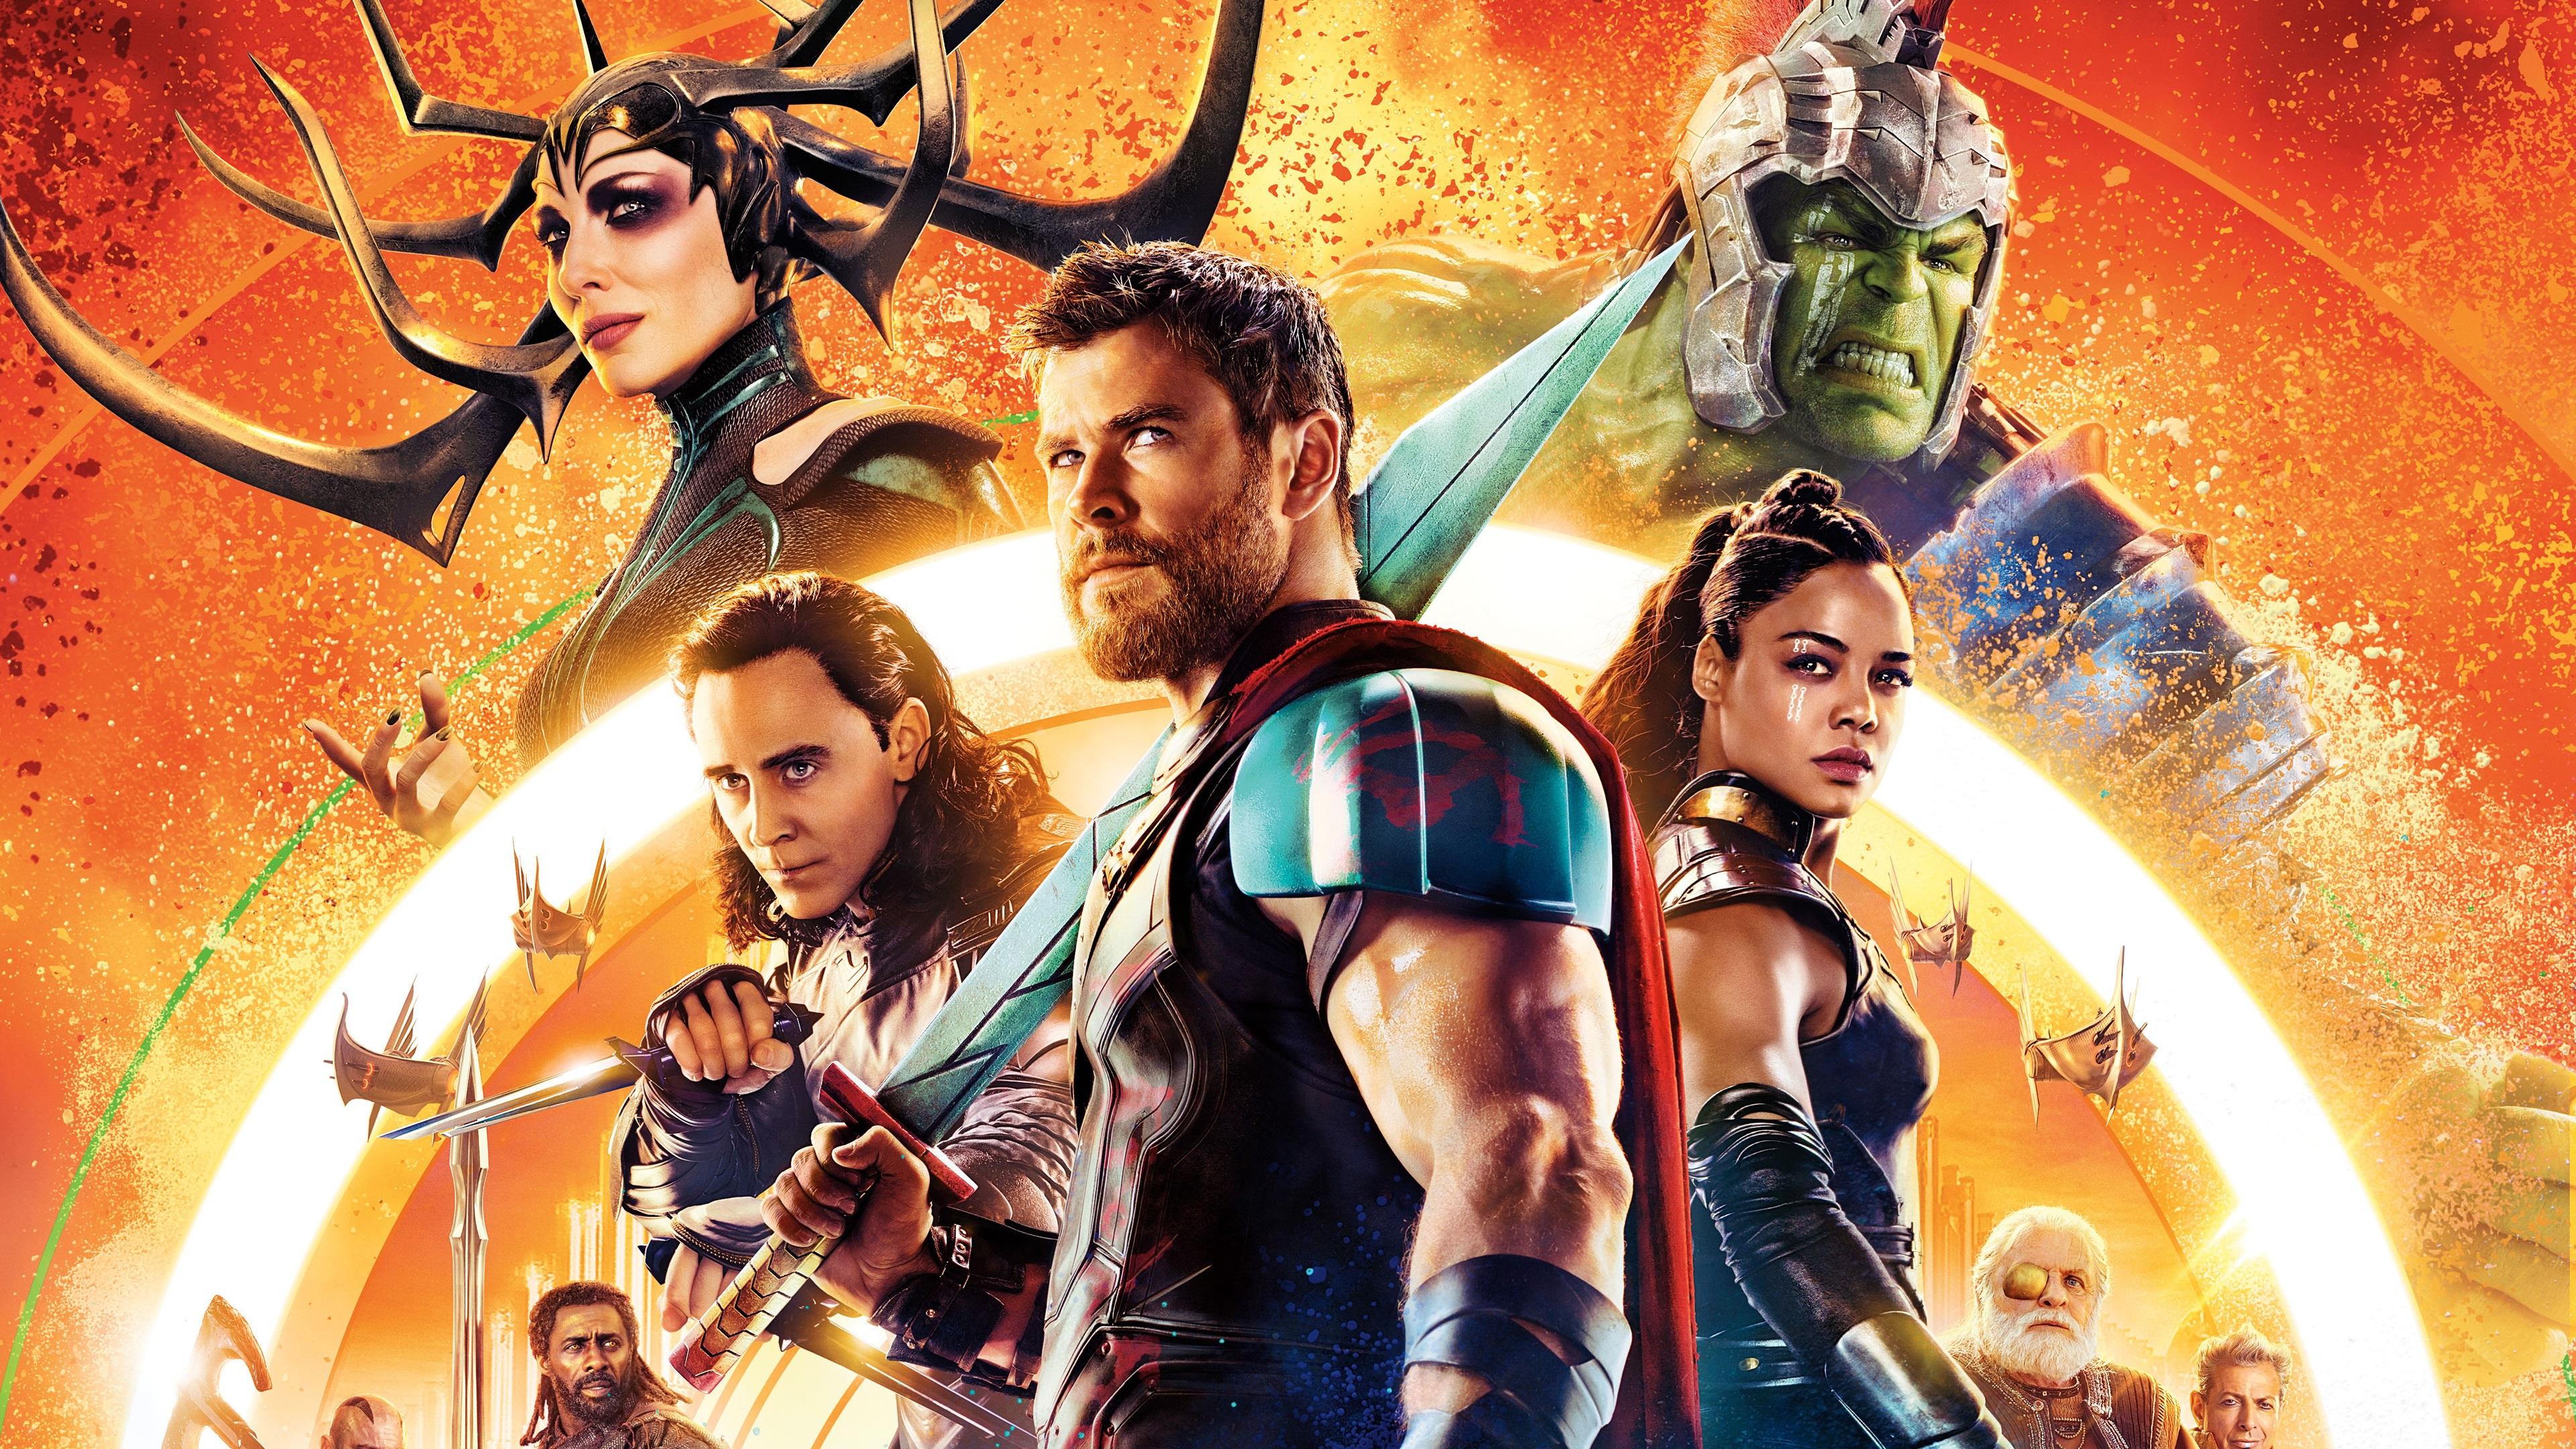 Wallpaper Thor Ragnarok 3840x2160 Uhd 4k Picture Image